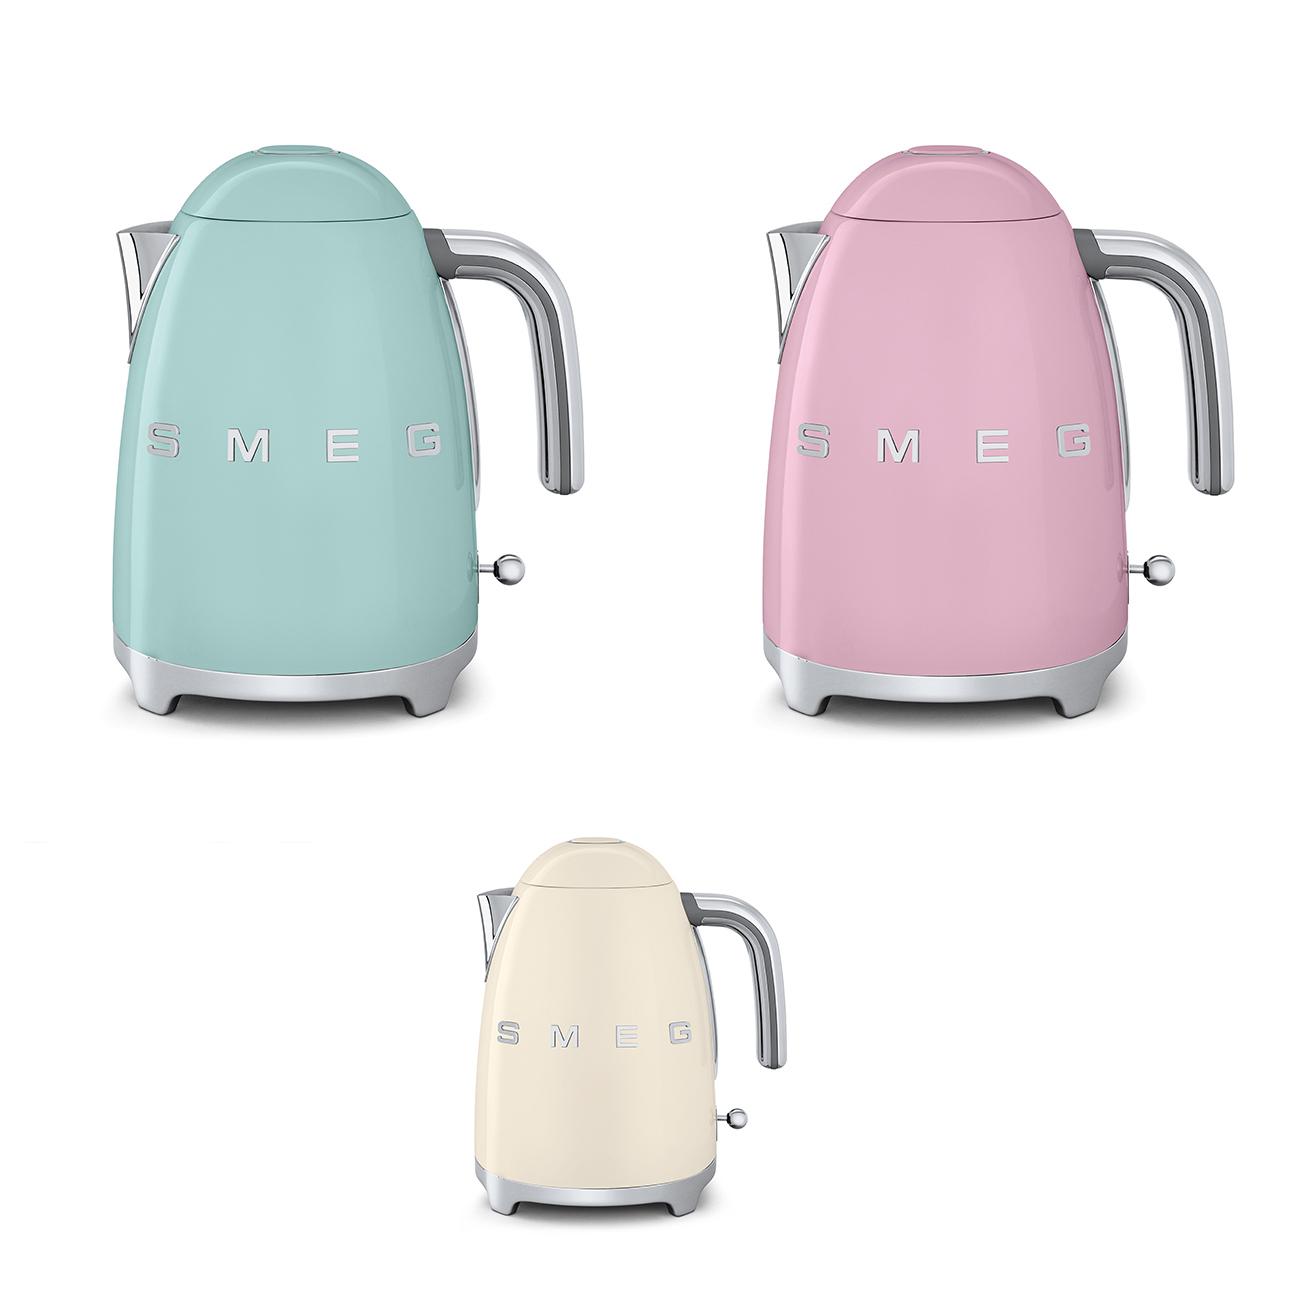 Wasserkocher-SMEG-creme-mint-rosa